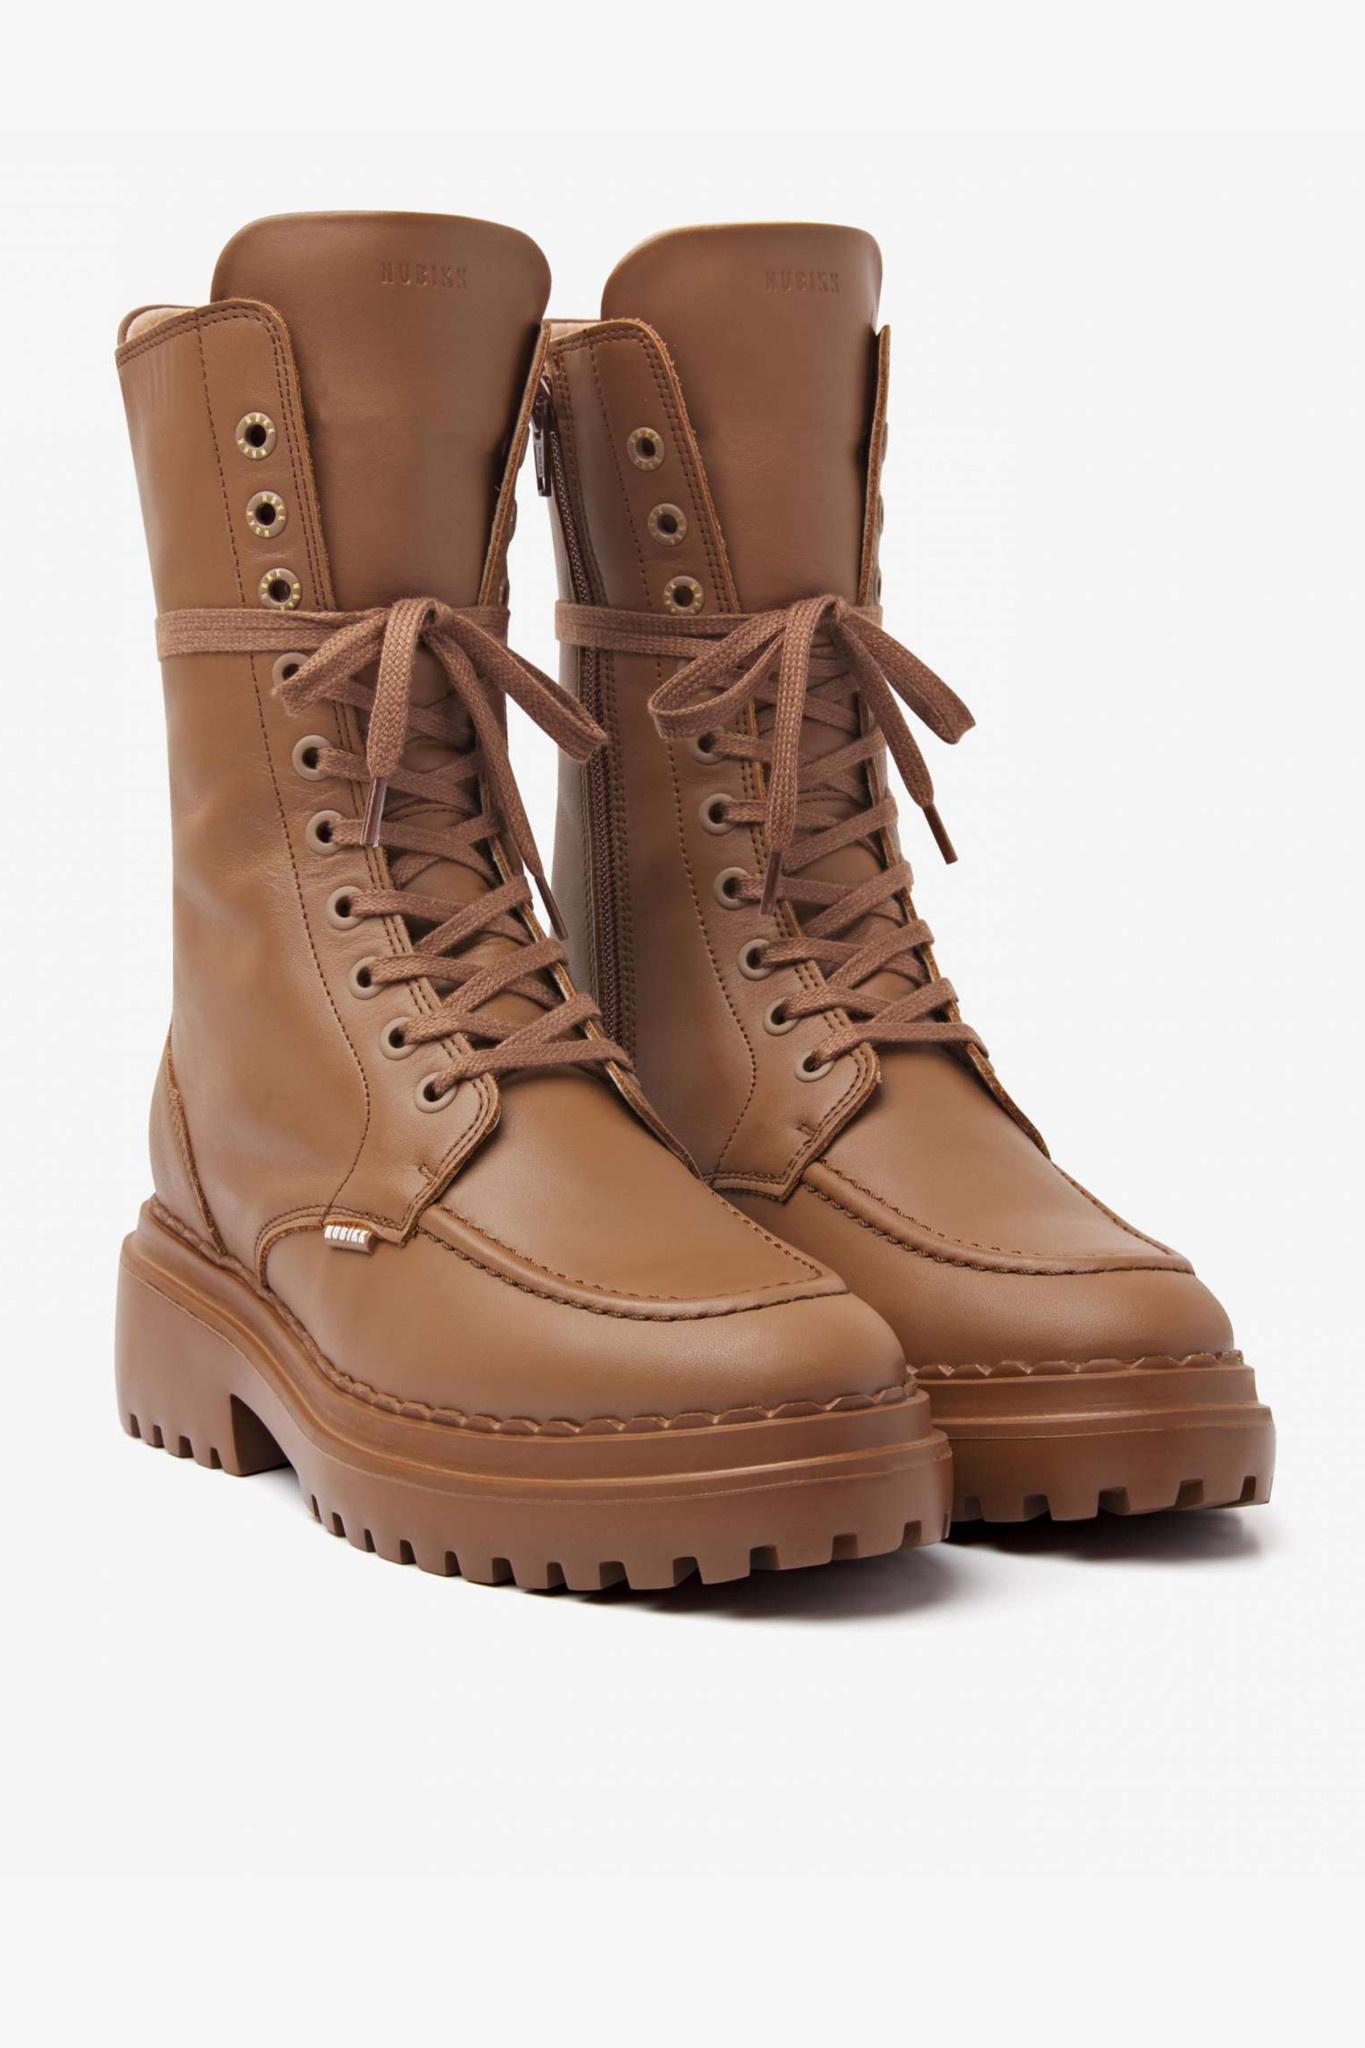 Fae Aubine Biker Boots - Hazel-1